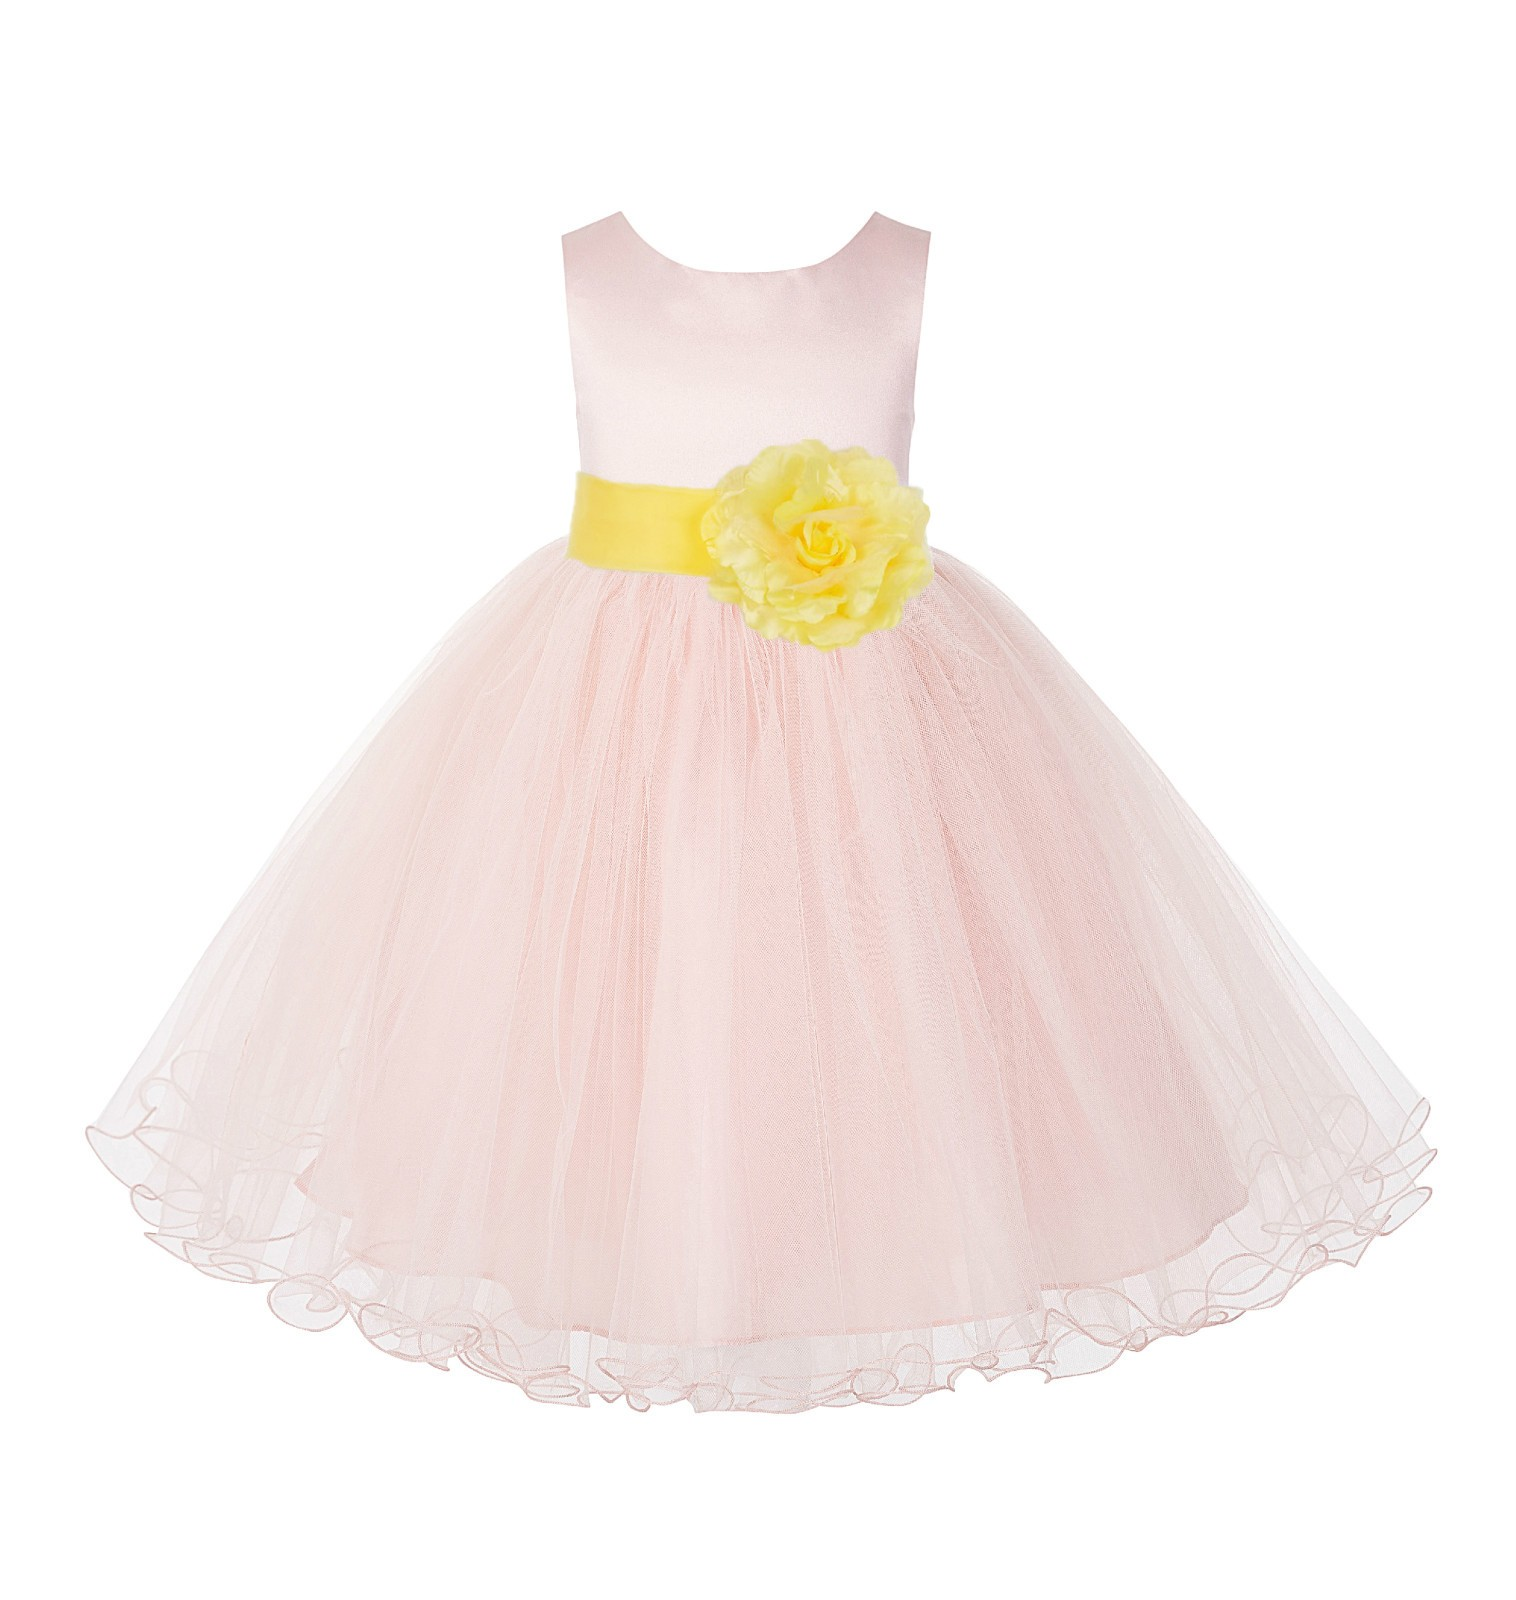 Blush Pink / Sunbeam Tulle Rattail Edge Flower Girl Dress Pageant Recital 829S